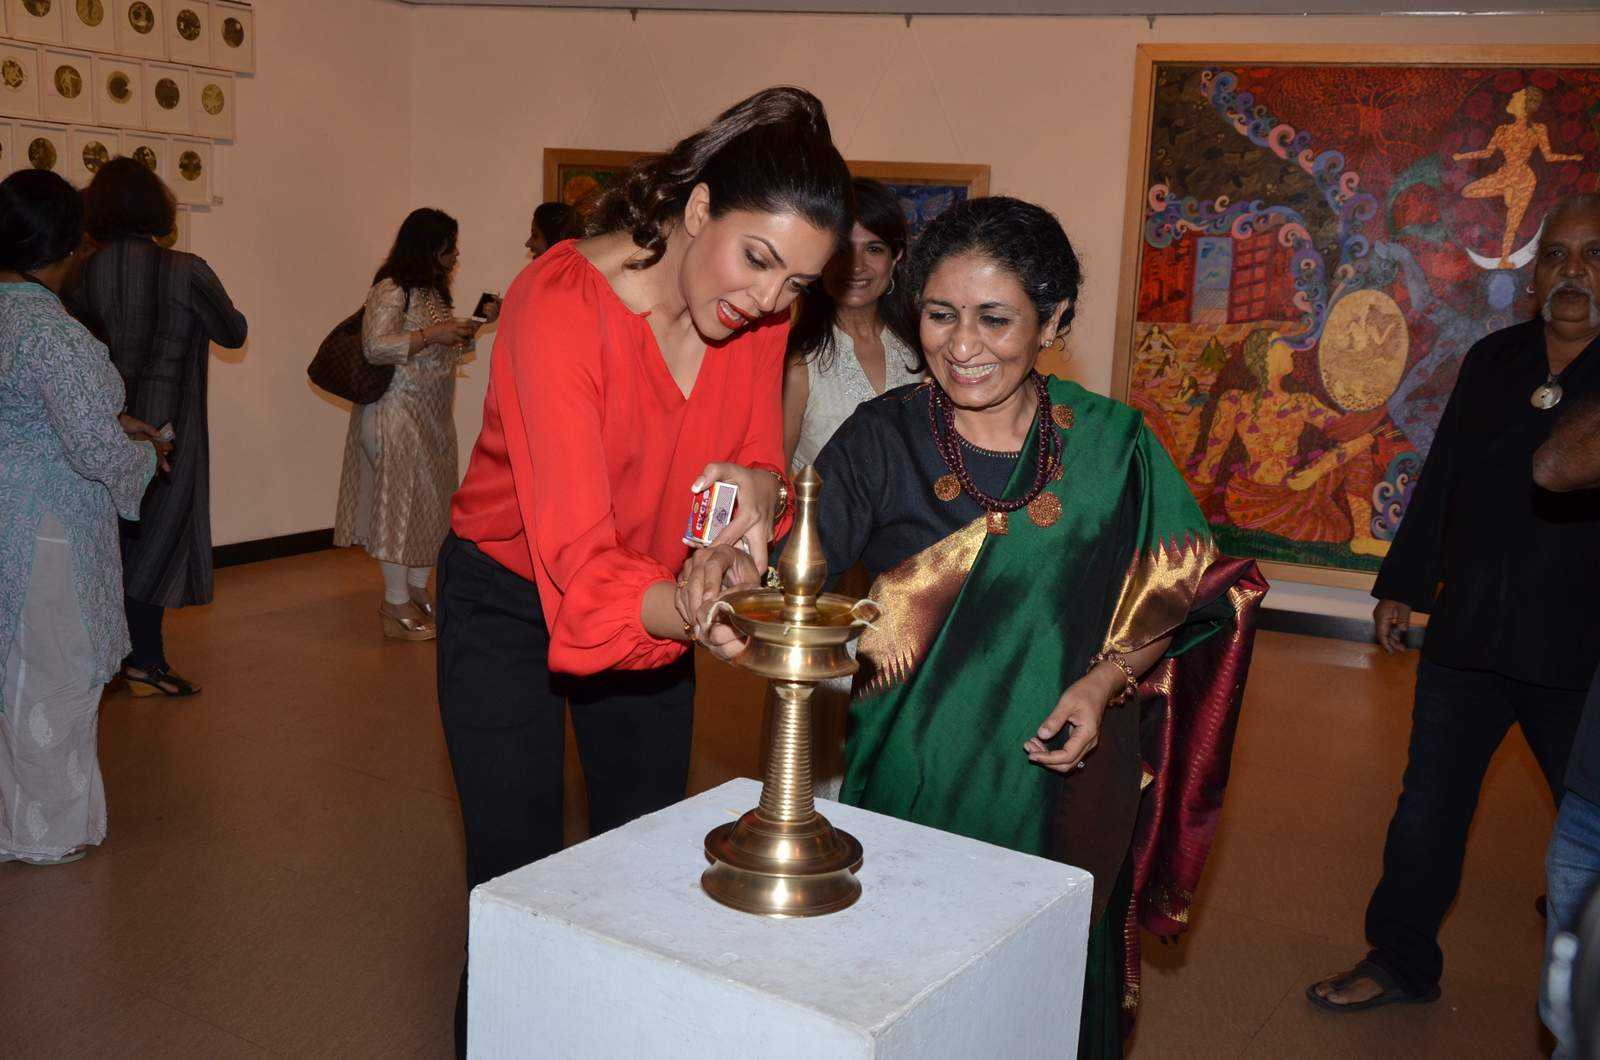 Sushmita Sen at Seema Kohli's exhibition inauguration event